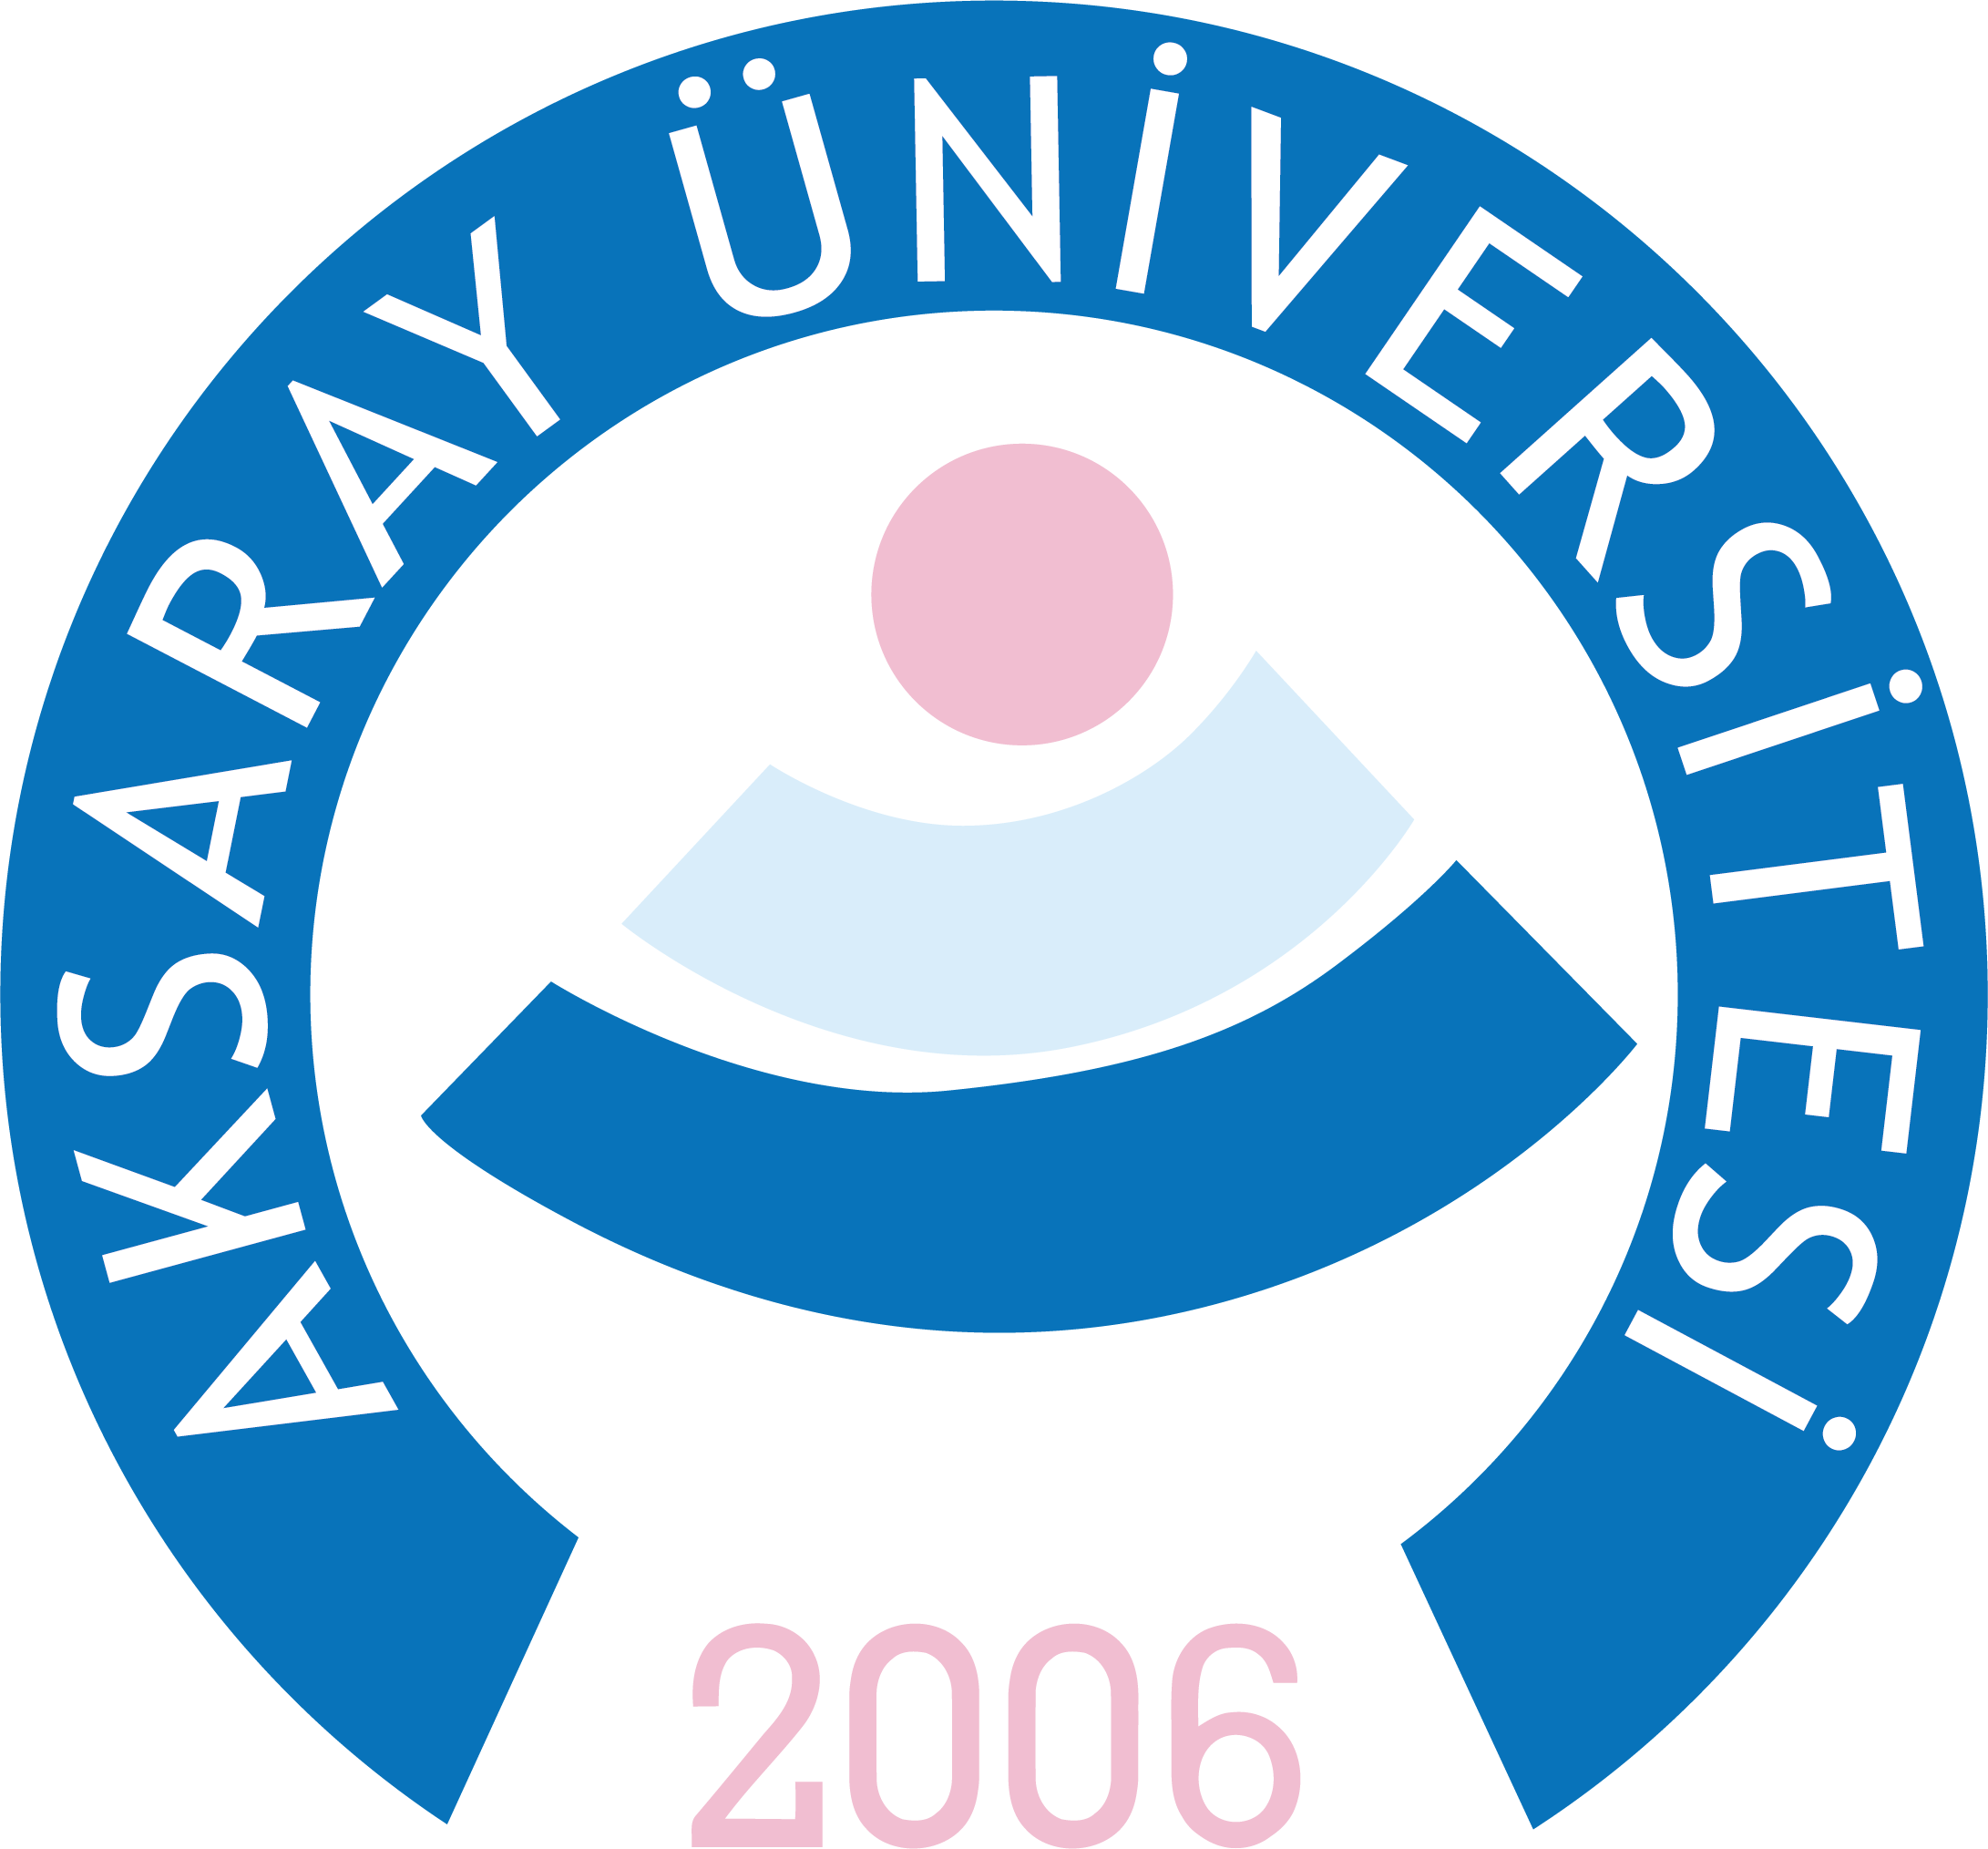 Aksaray Üniversitesi Logo Amblem Download Vector